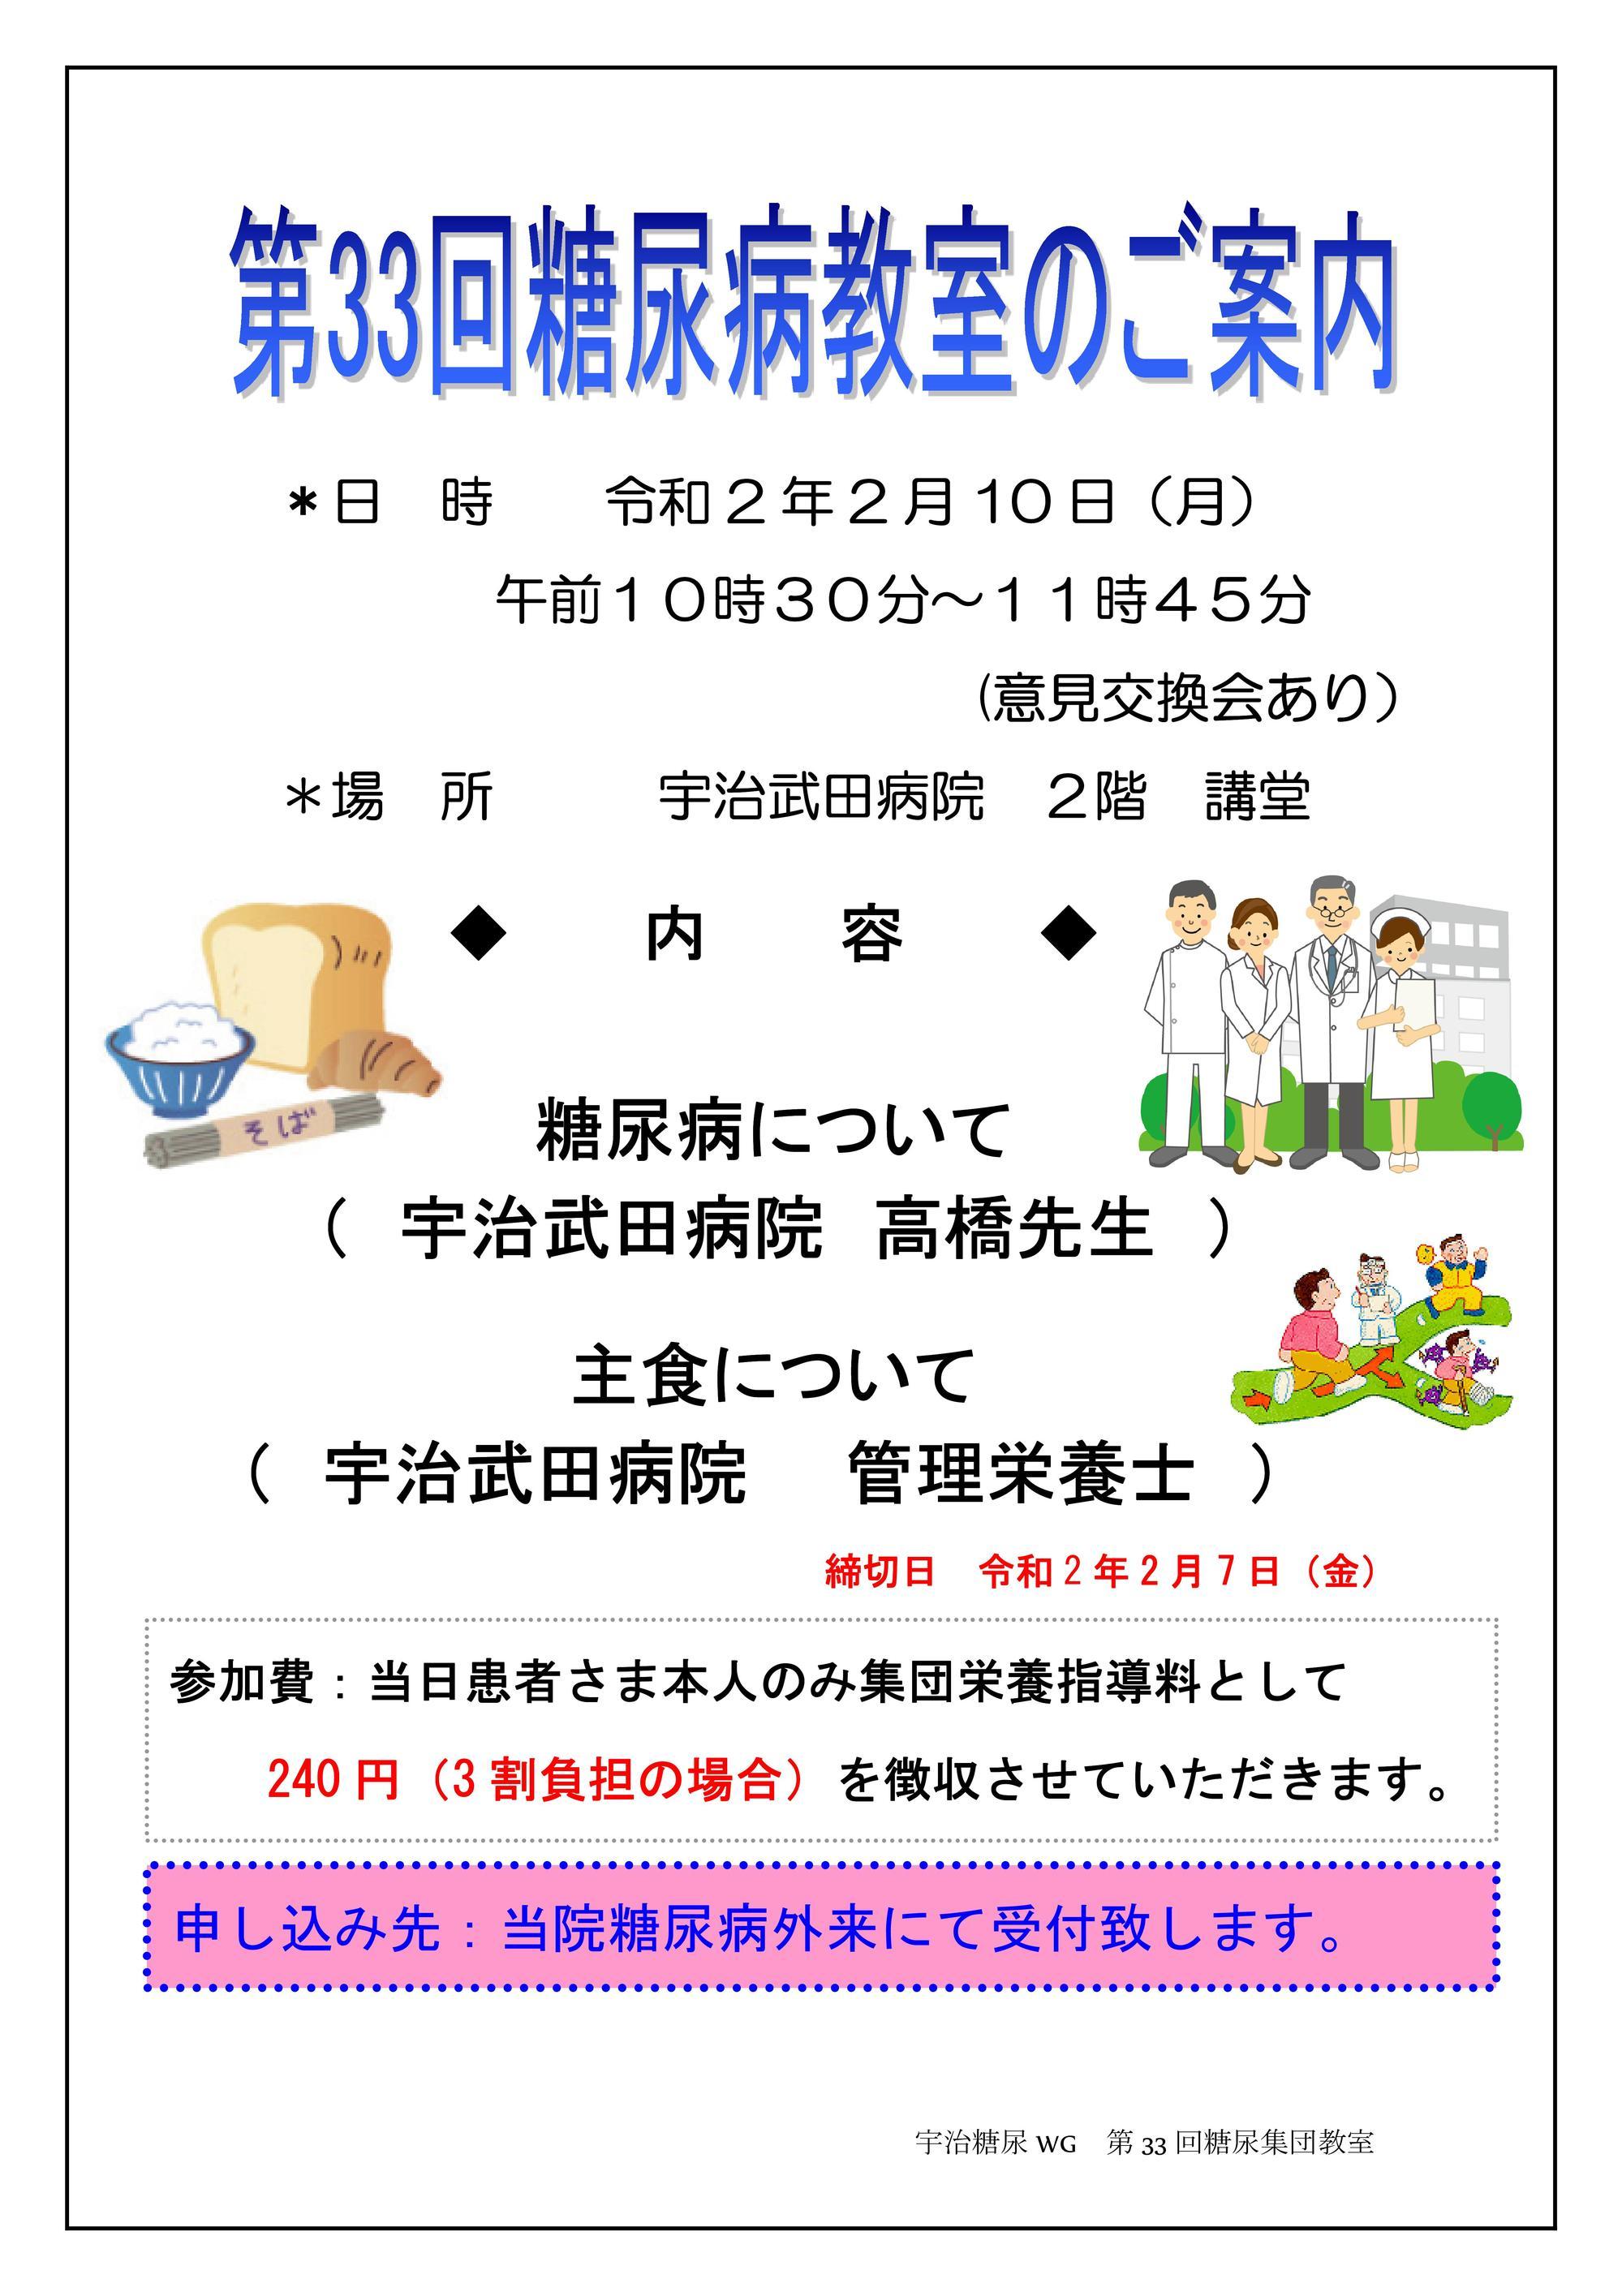 https://www.takedahp.or.jp/publicity/assets_c/2020/01/tounyoubyou-thumb-autox2830-35930.jpg